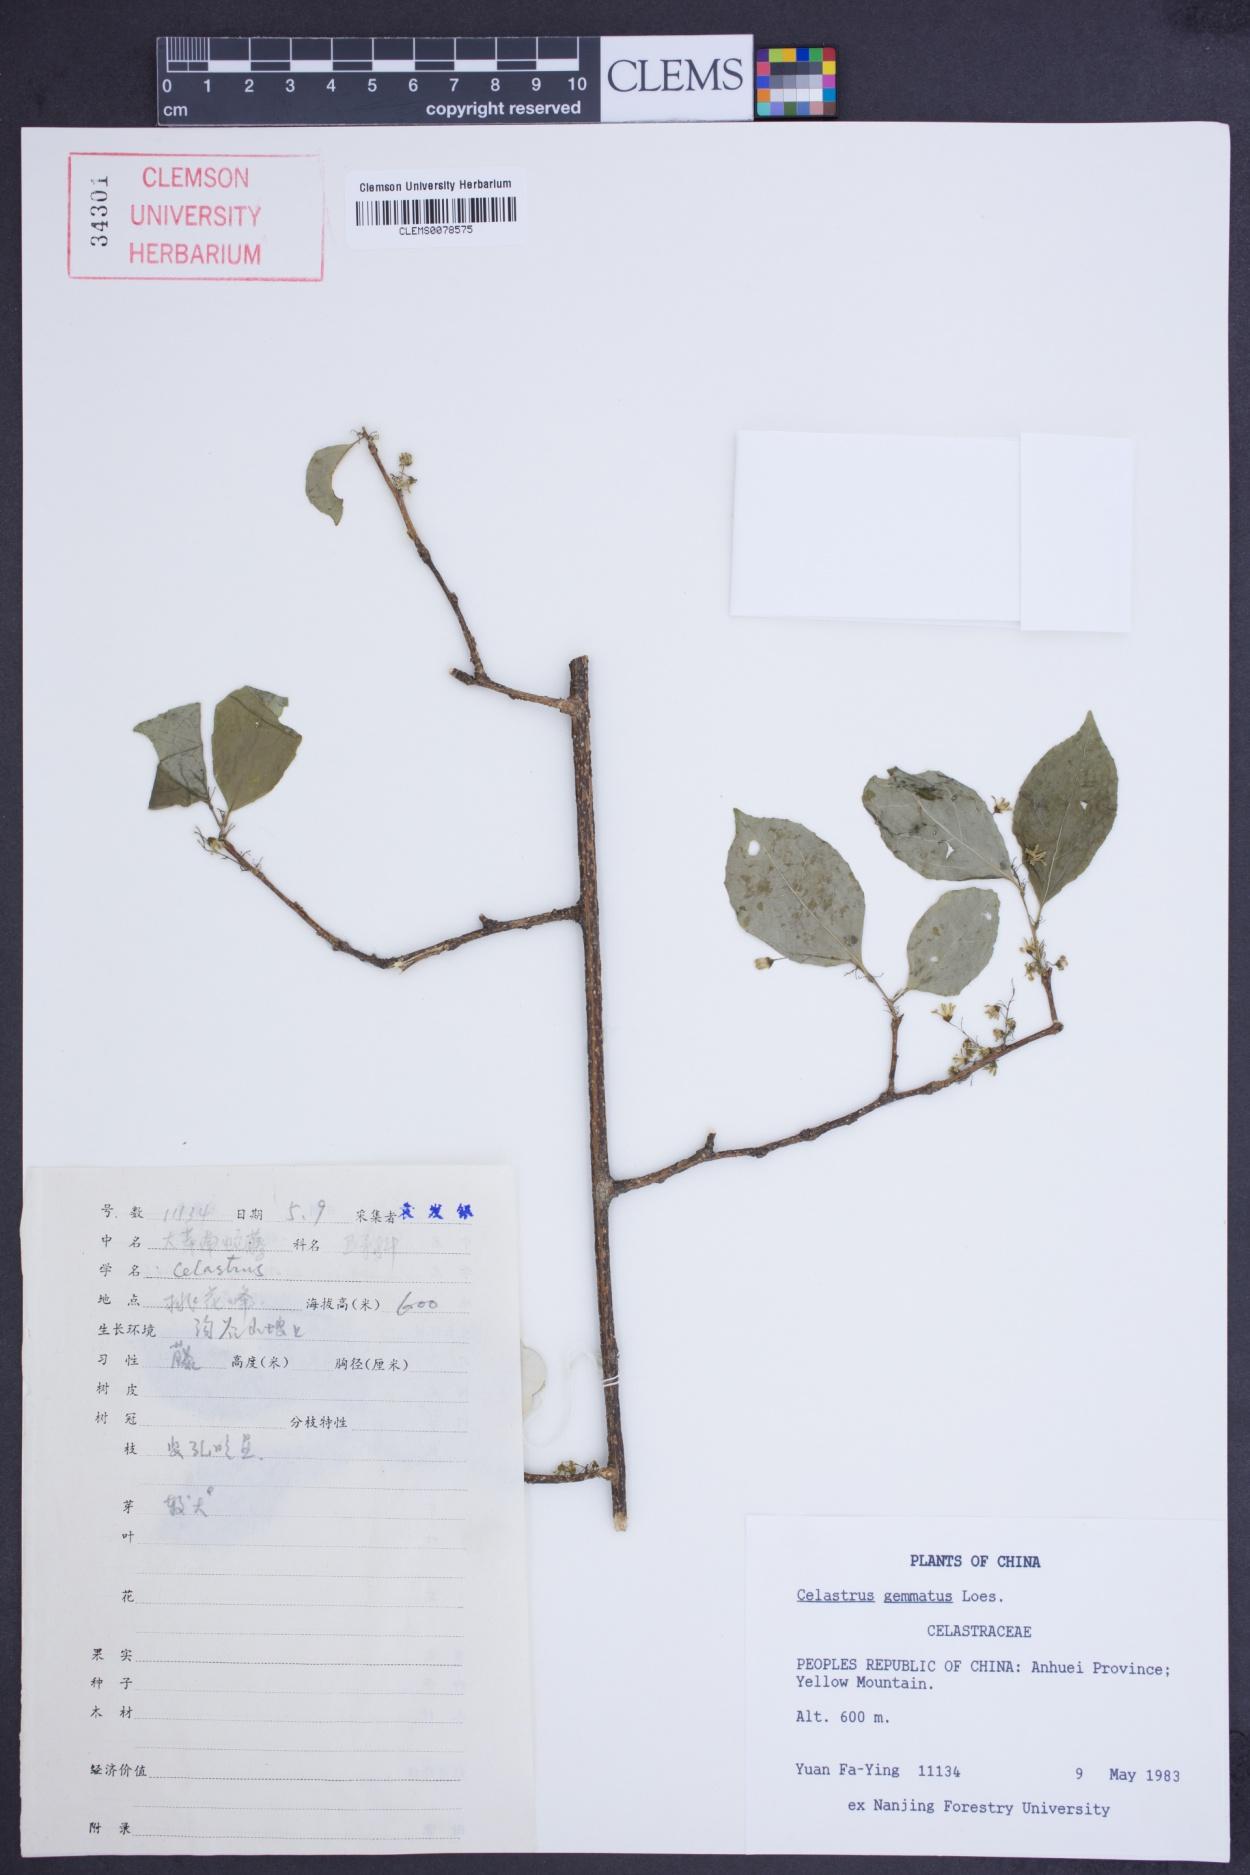 Celastrus gemmatus image